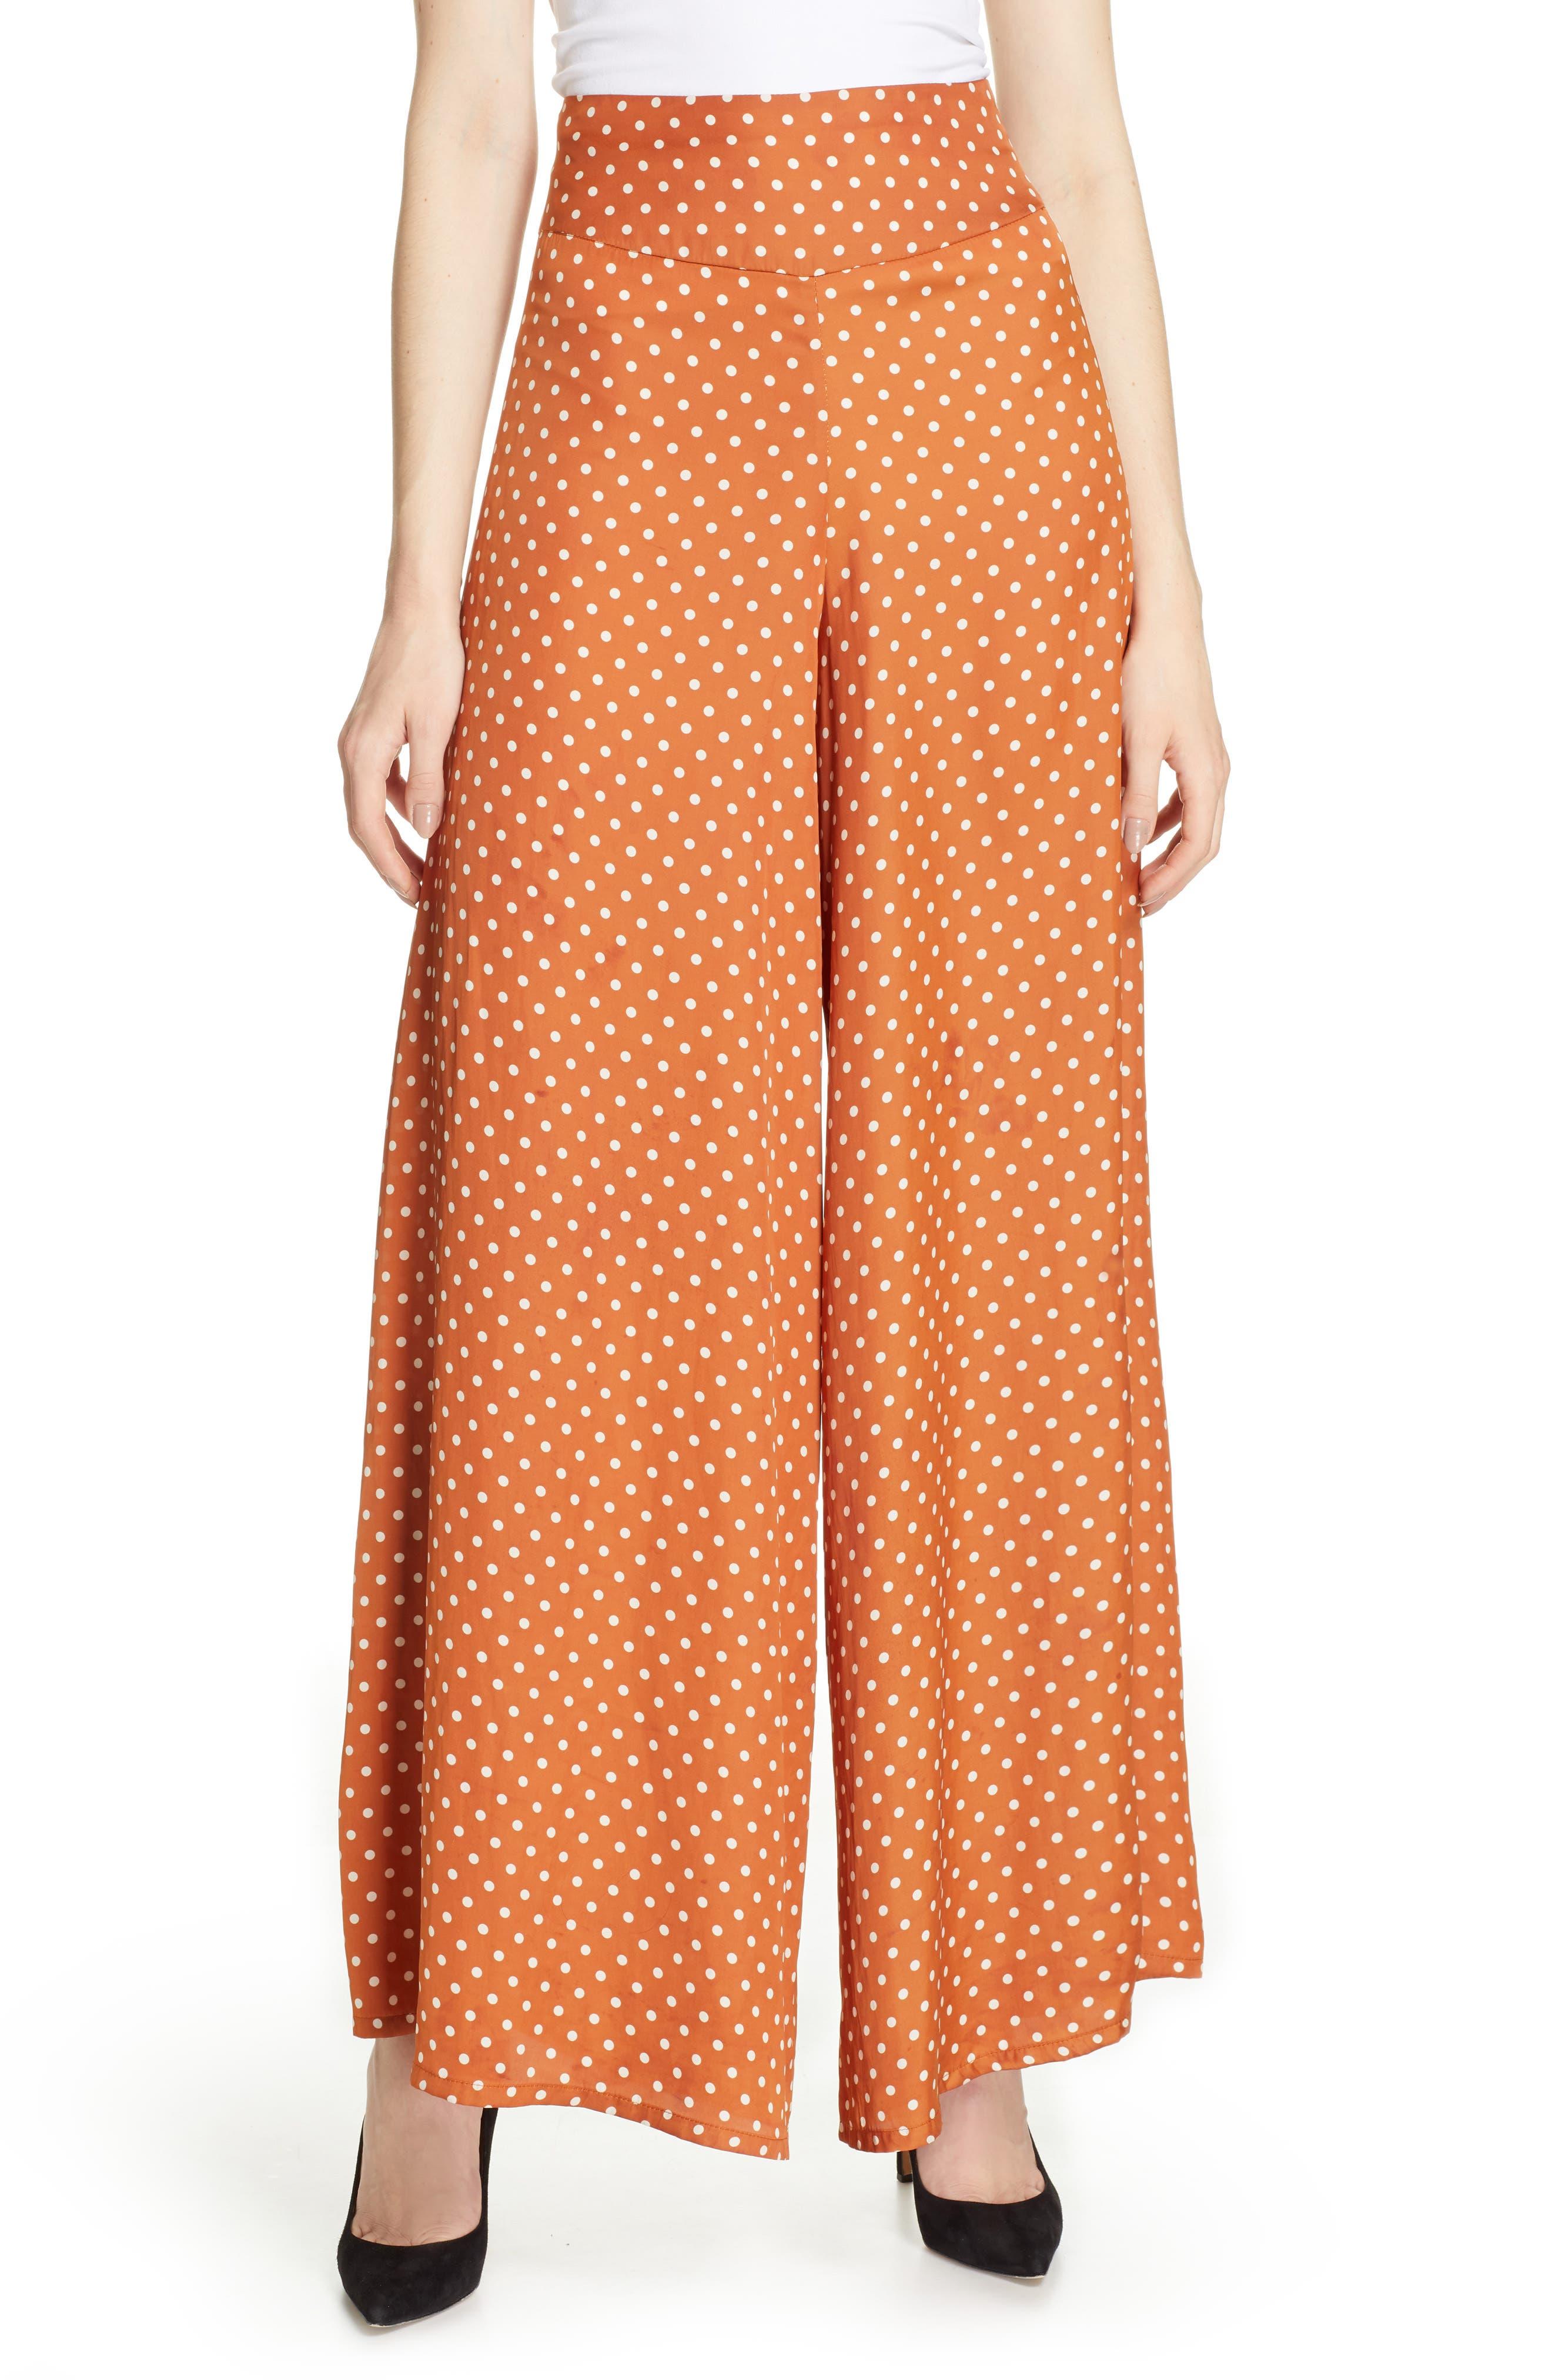 1930s Wide Leg Pants and Beach Pajamas Womens Smythe Polka Dot Palazzo Pants $197.98 AT vintagedancer.com